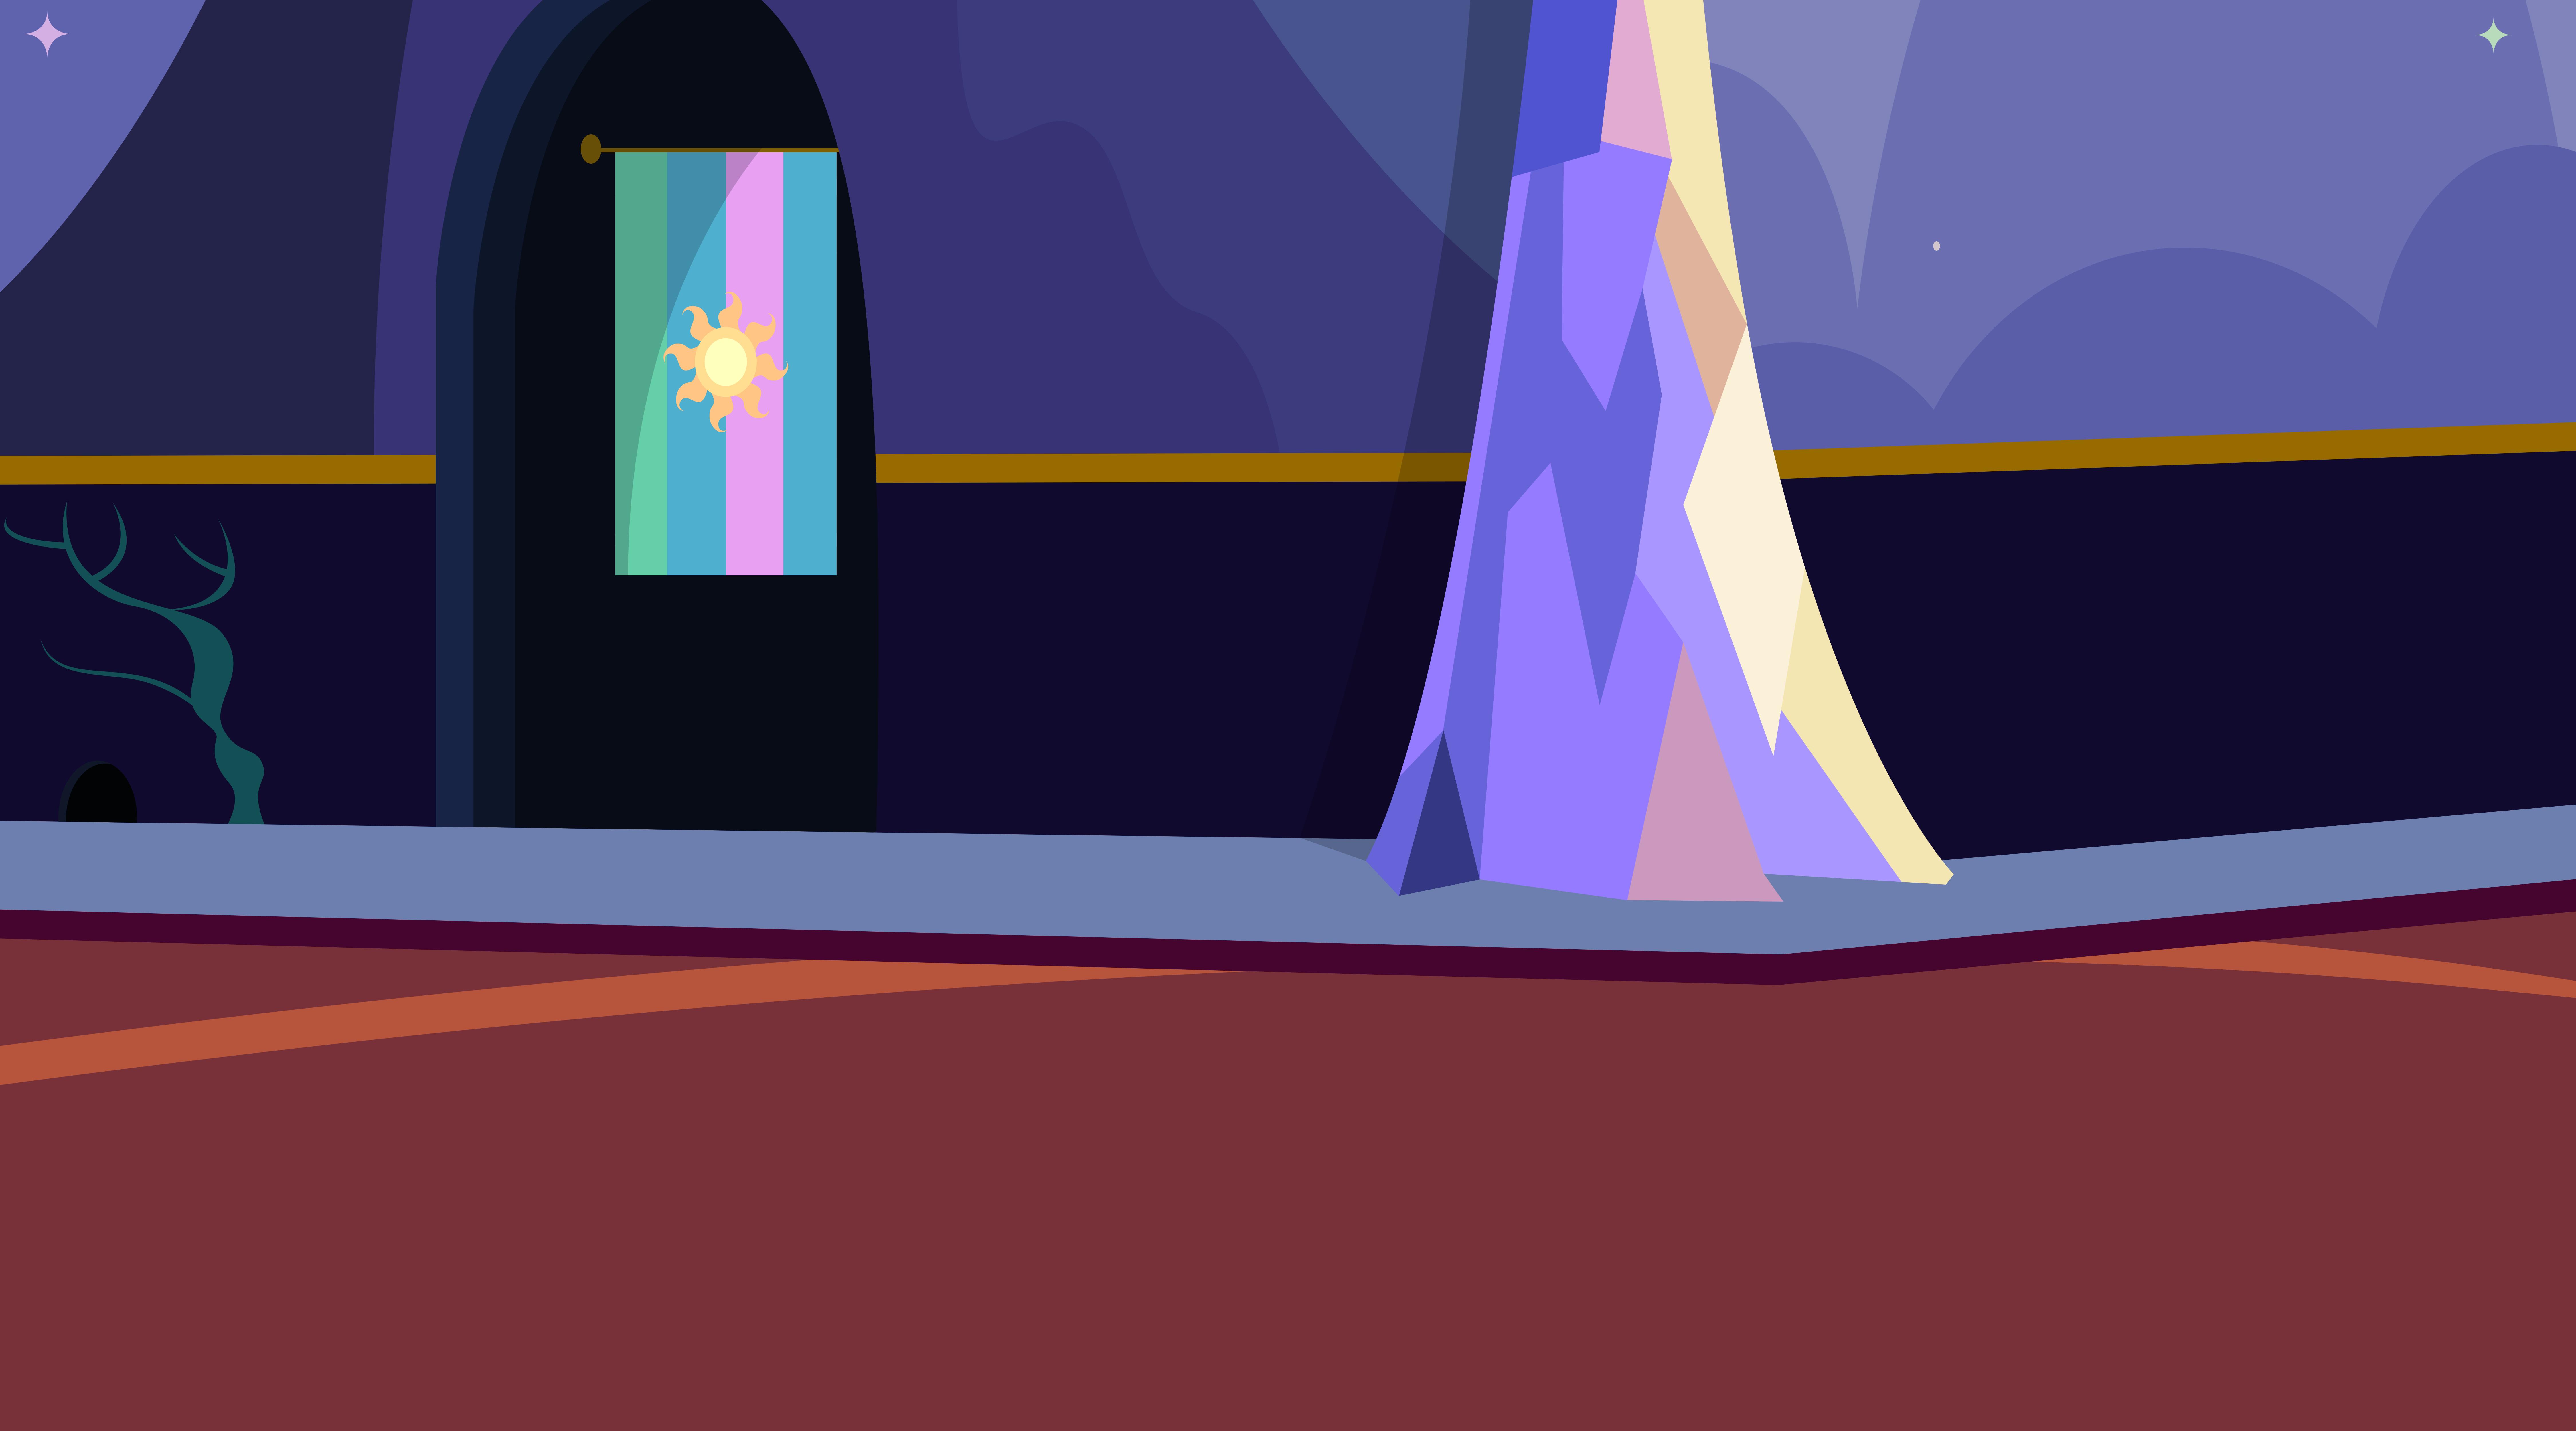 Background: Twilight's Castle 4